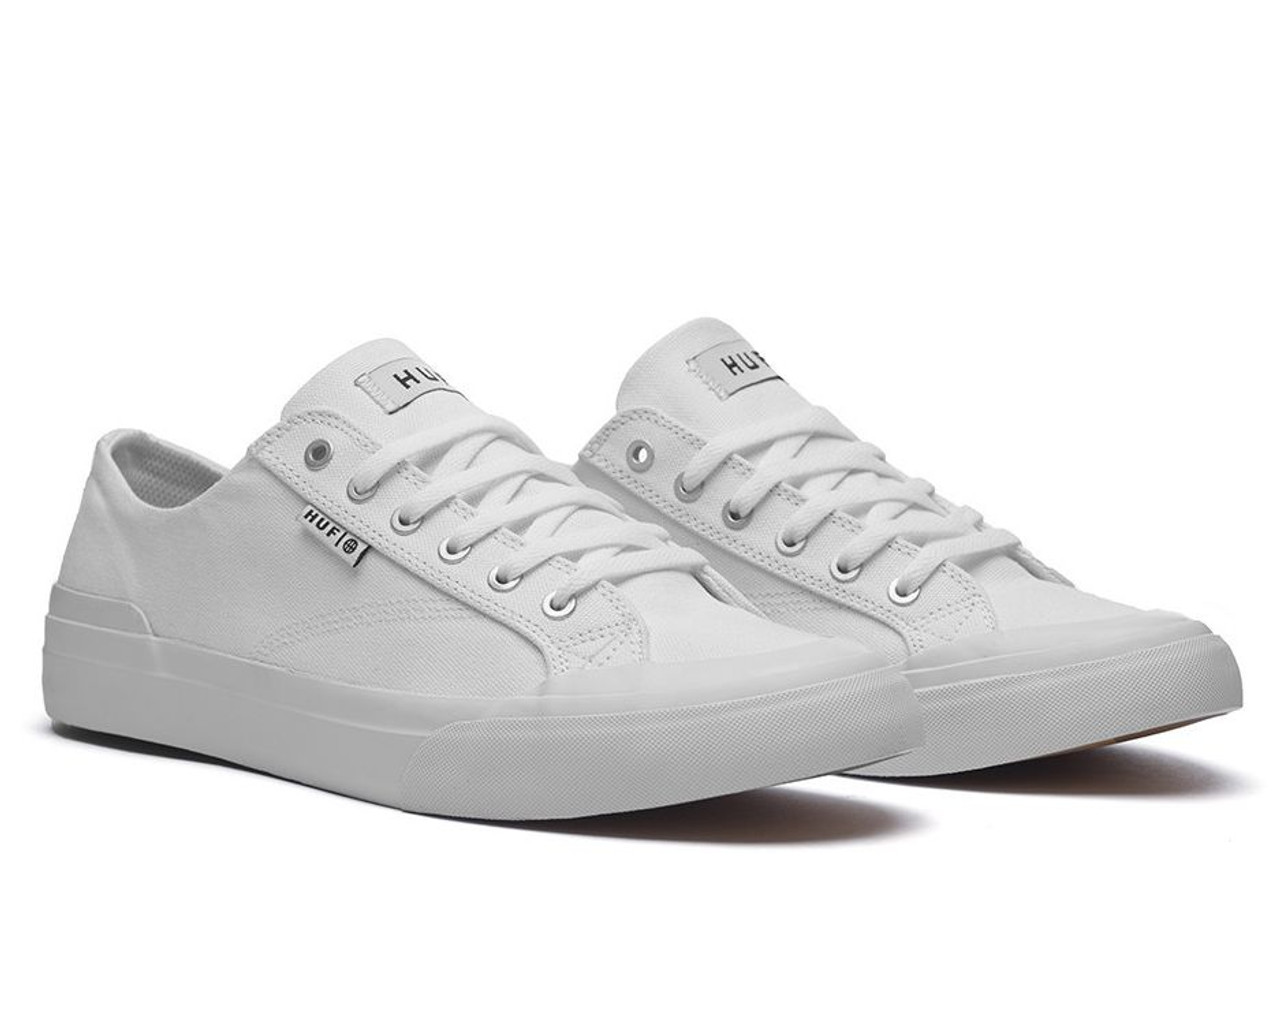 2bea39a59aac HUF Classic Lo ESS TX vegan skate shoe